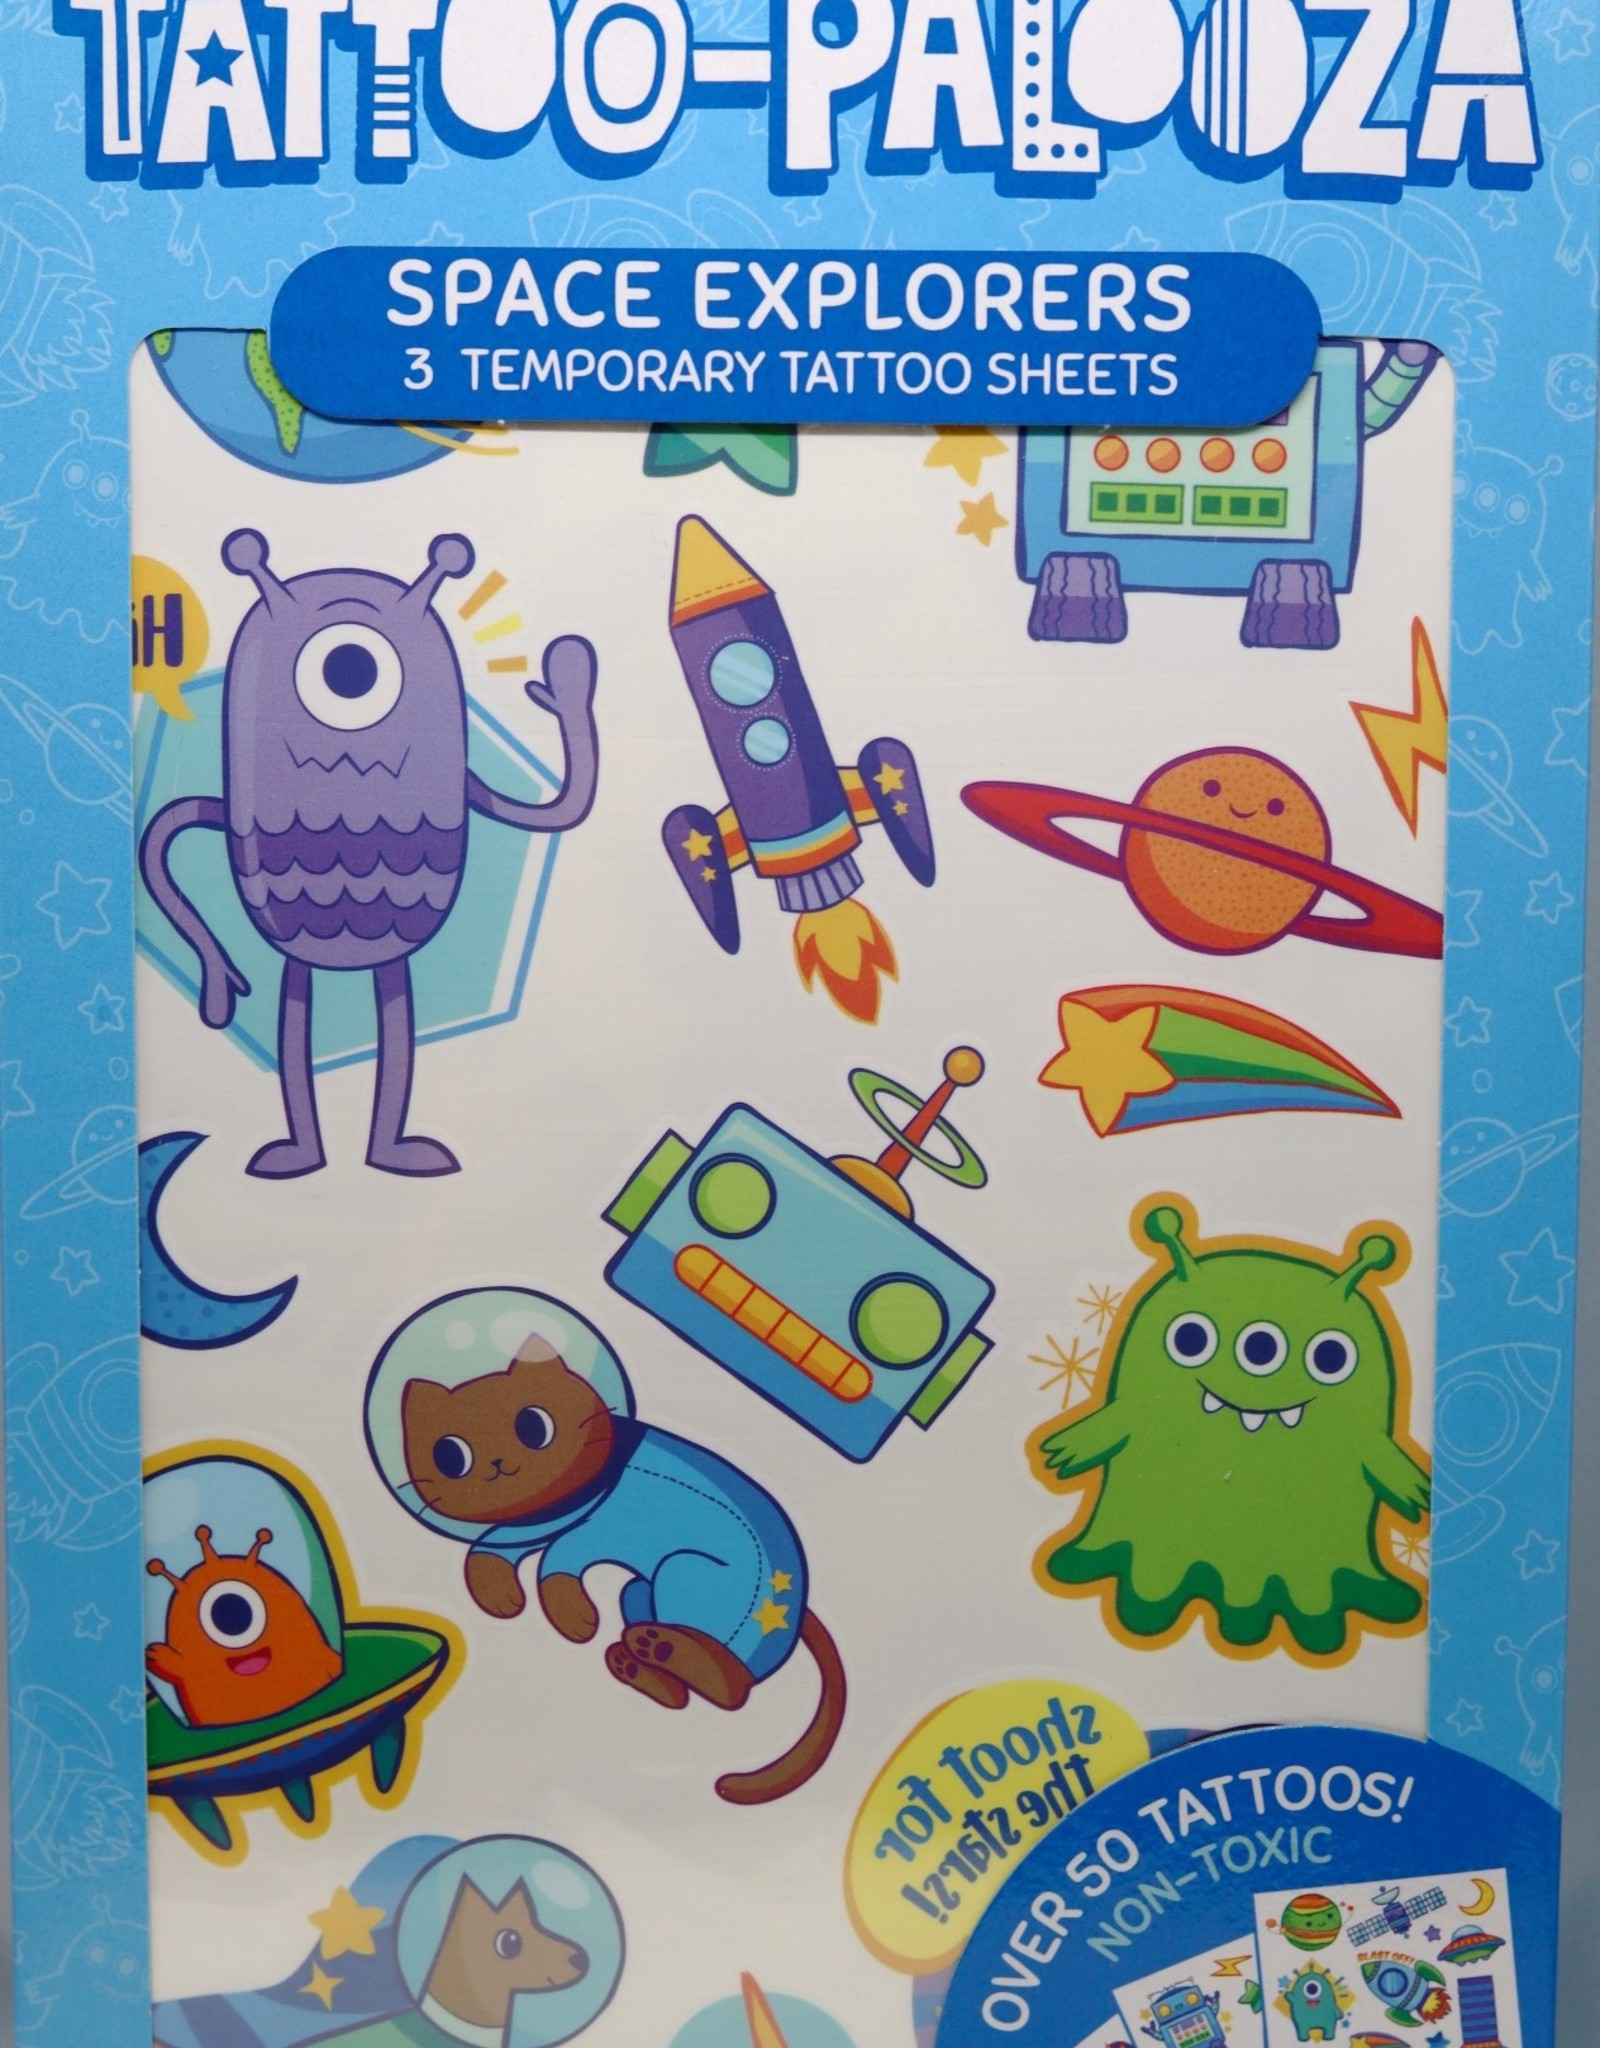 OOLY TATTOO PALOOZA TEMPORARY TATTOOS - SPACE EXPLORERS